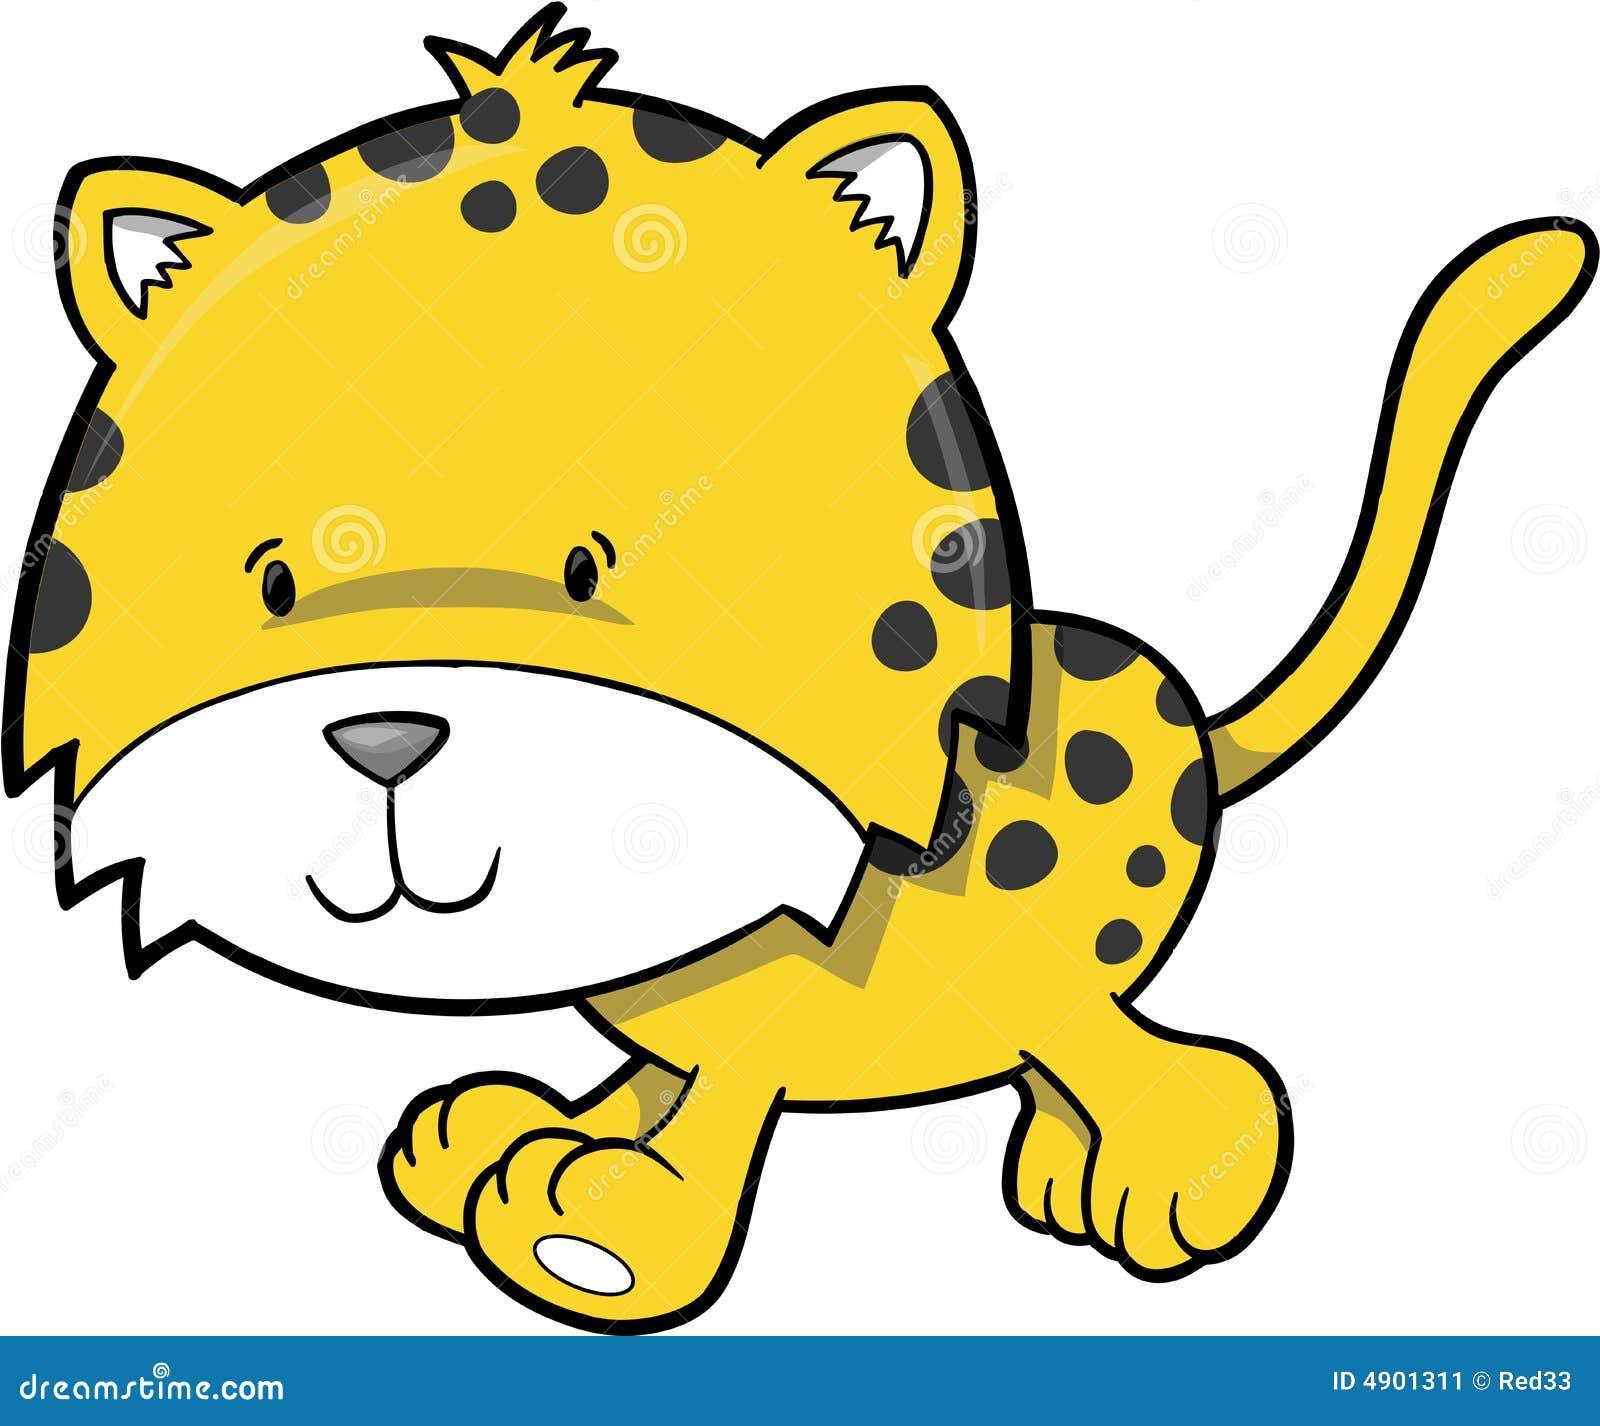 Cheetah Vector Illustration Stock Image - Image: 4901311